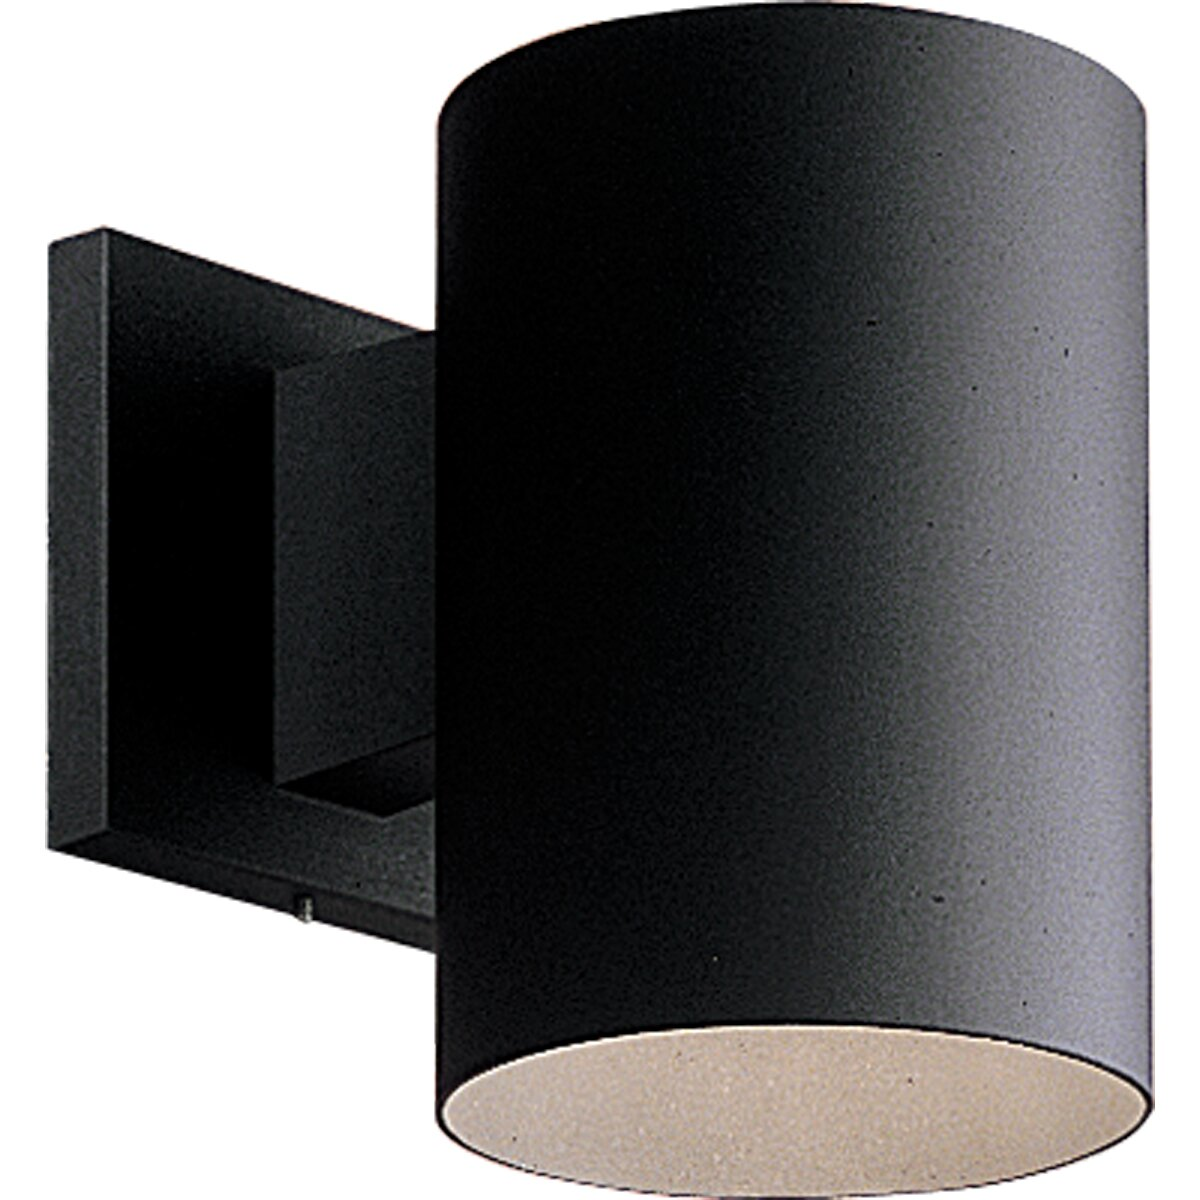 Progress Lighting Cylinder 1-Light Outdoor Sconce